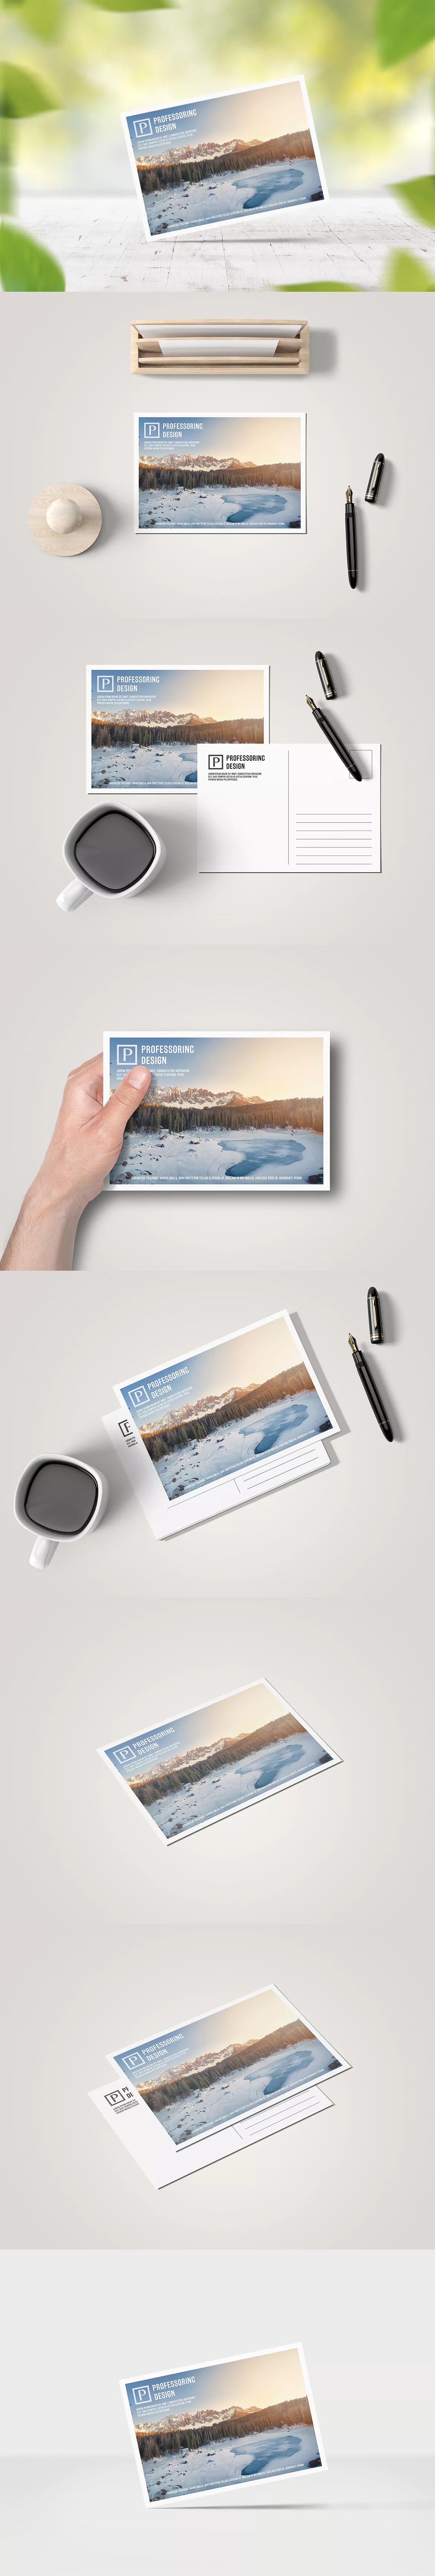 a6 postcard / greeting card mock-up | mockup templates | pinterest, Presentation templates